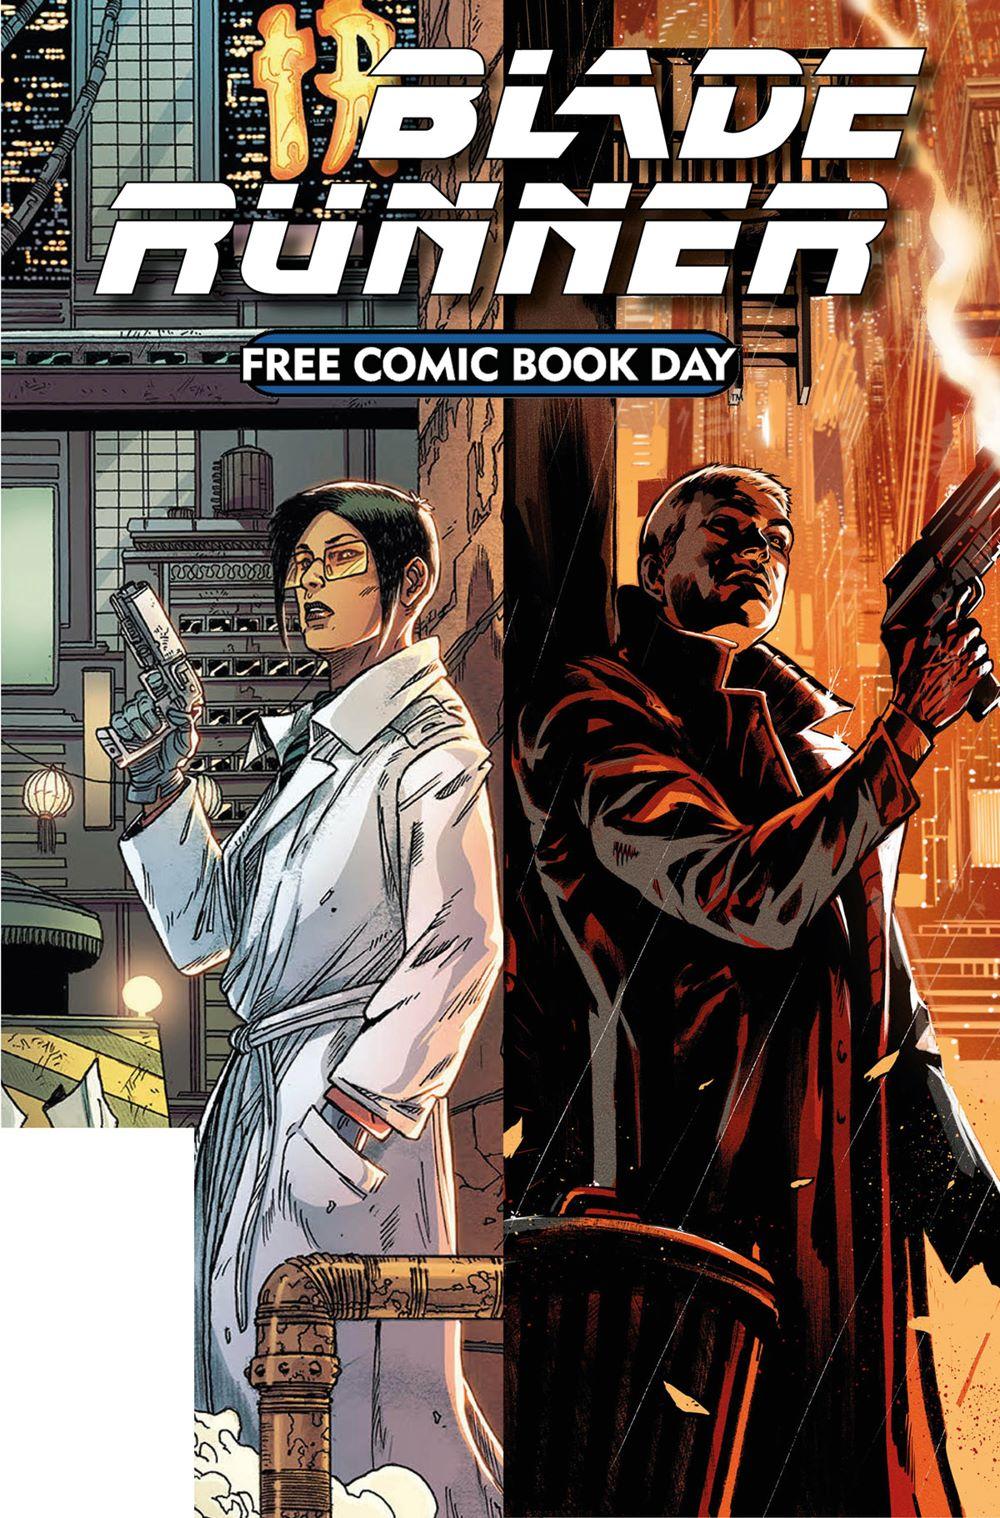 FCBD21_GOLD_Titan-Comics_Blade-Runner Free Comic Book Day 2021 Gold Sponsor Comic Books announced